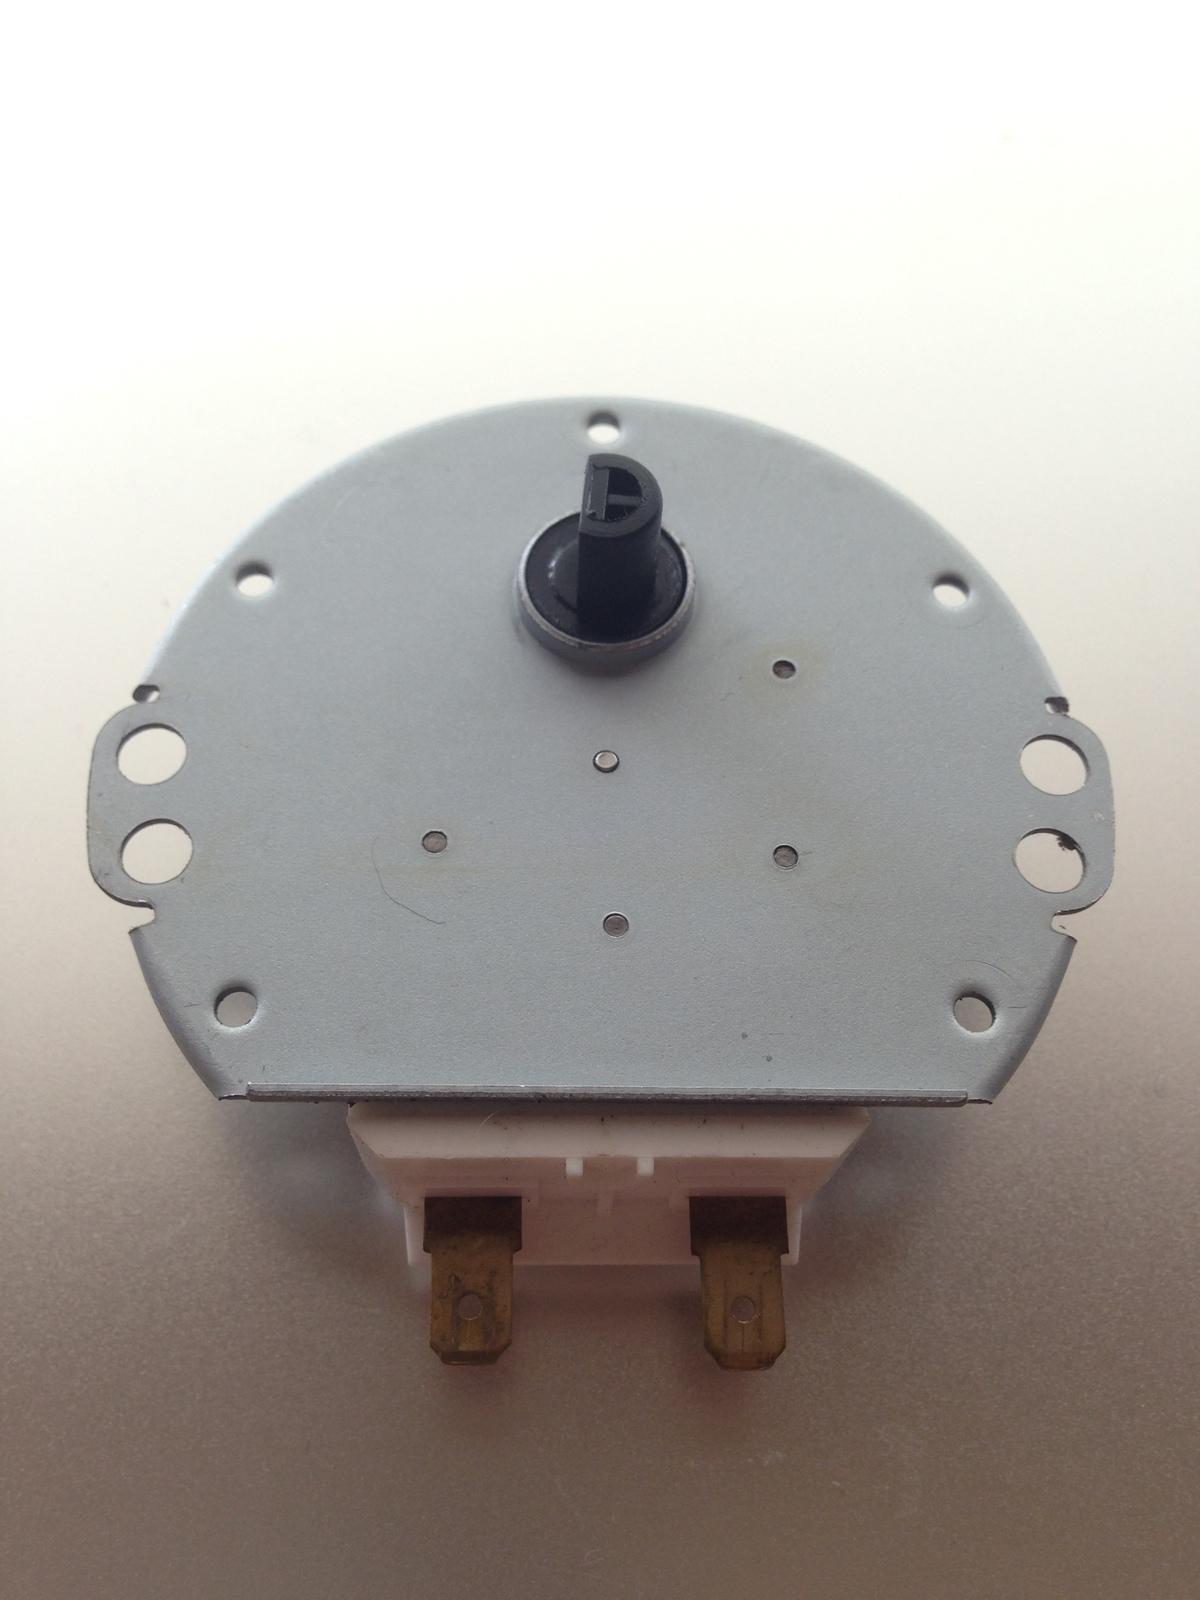 General electric microwave oem 72180019401 turntable motor for Ge electric motor repair parts